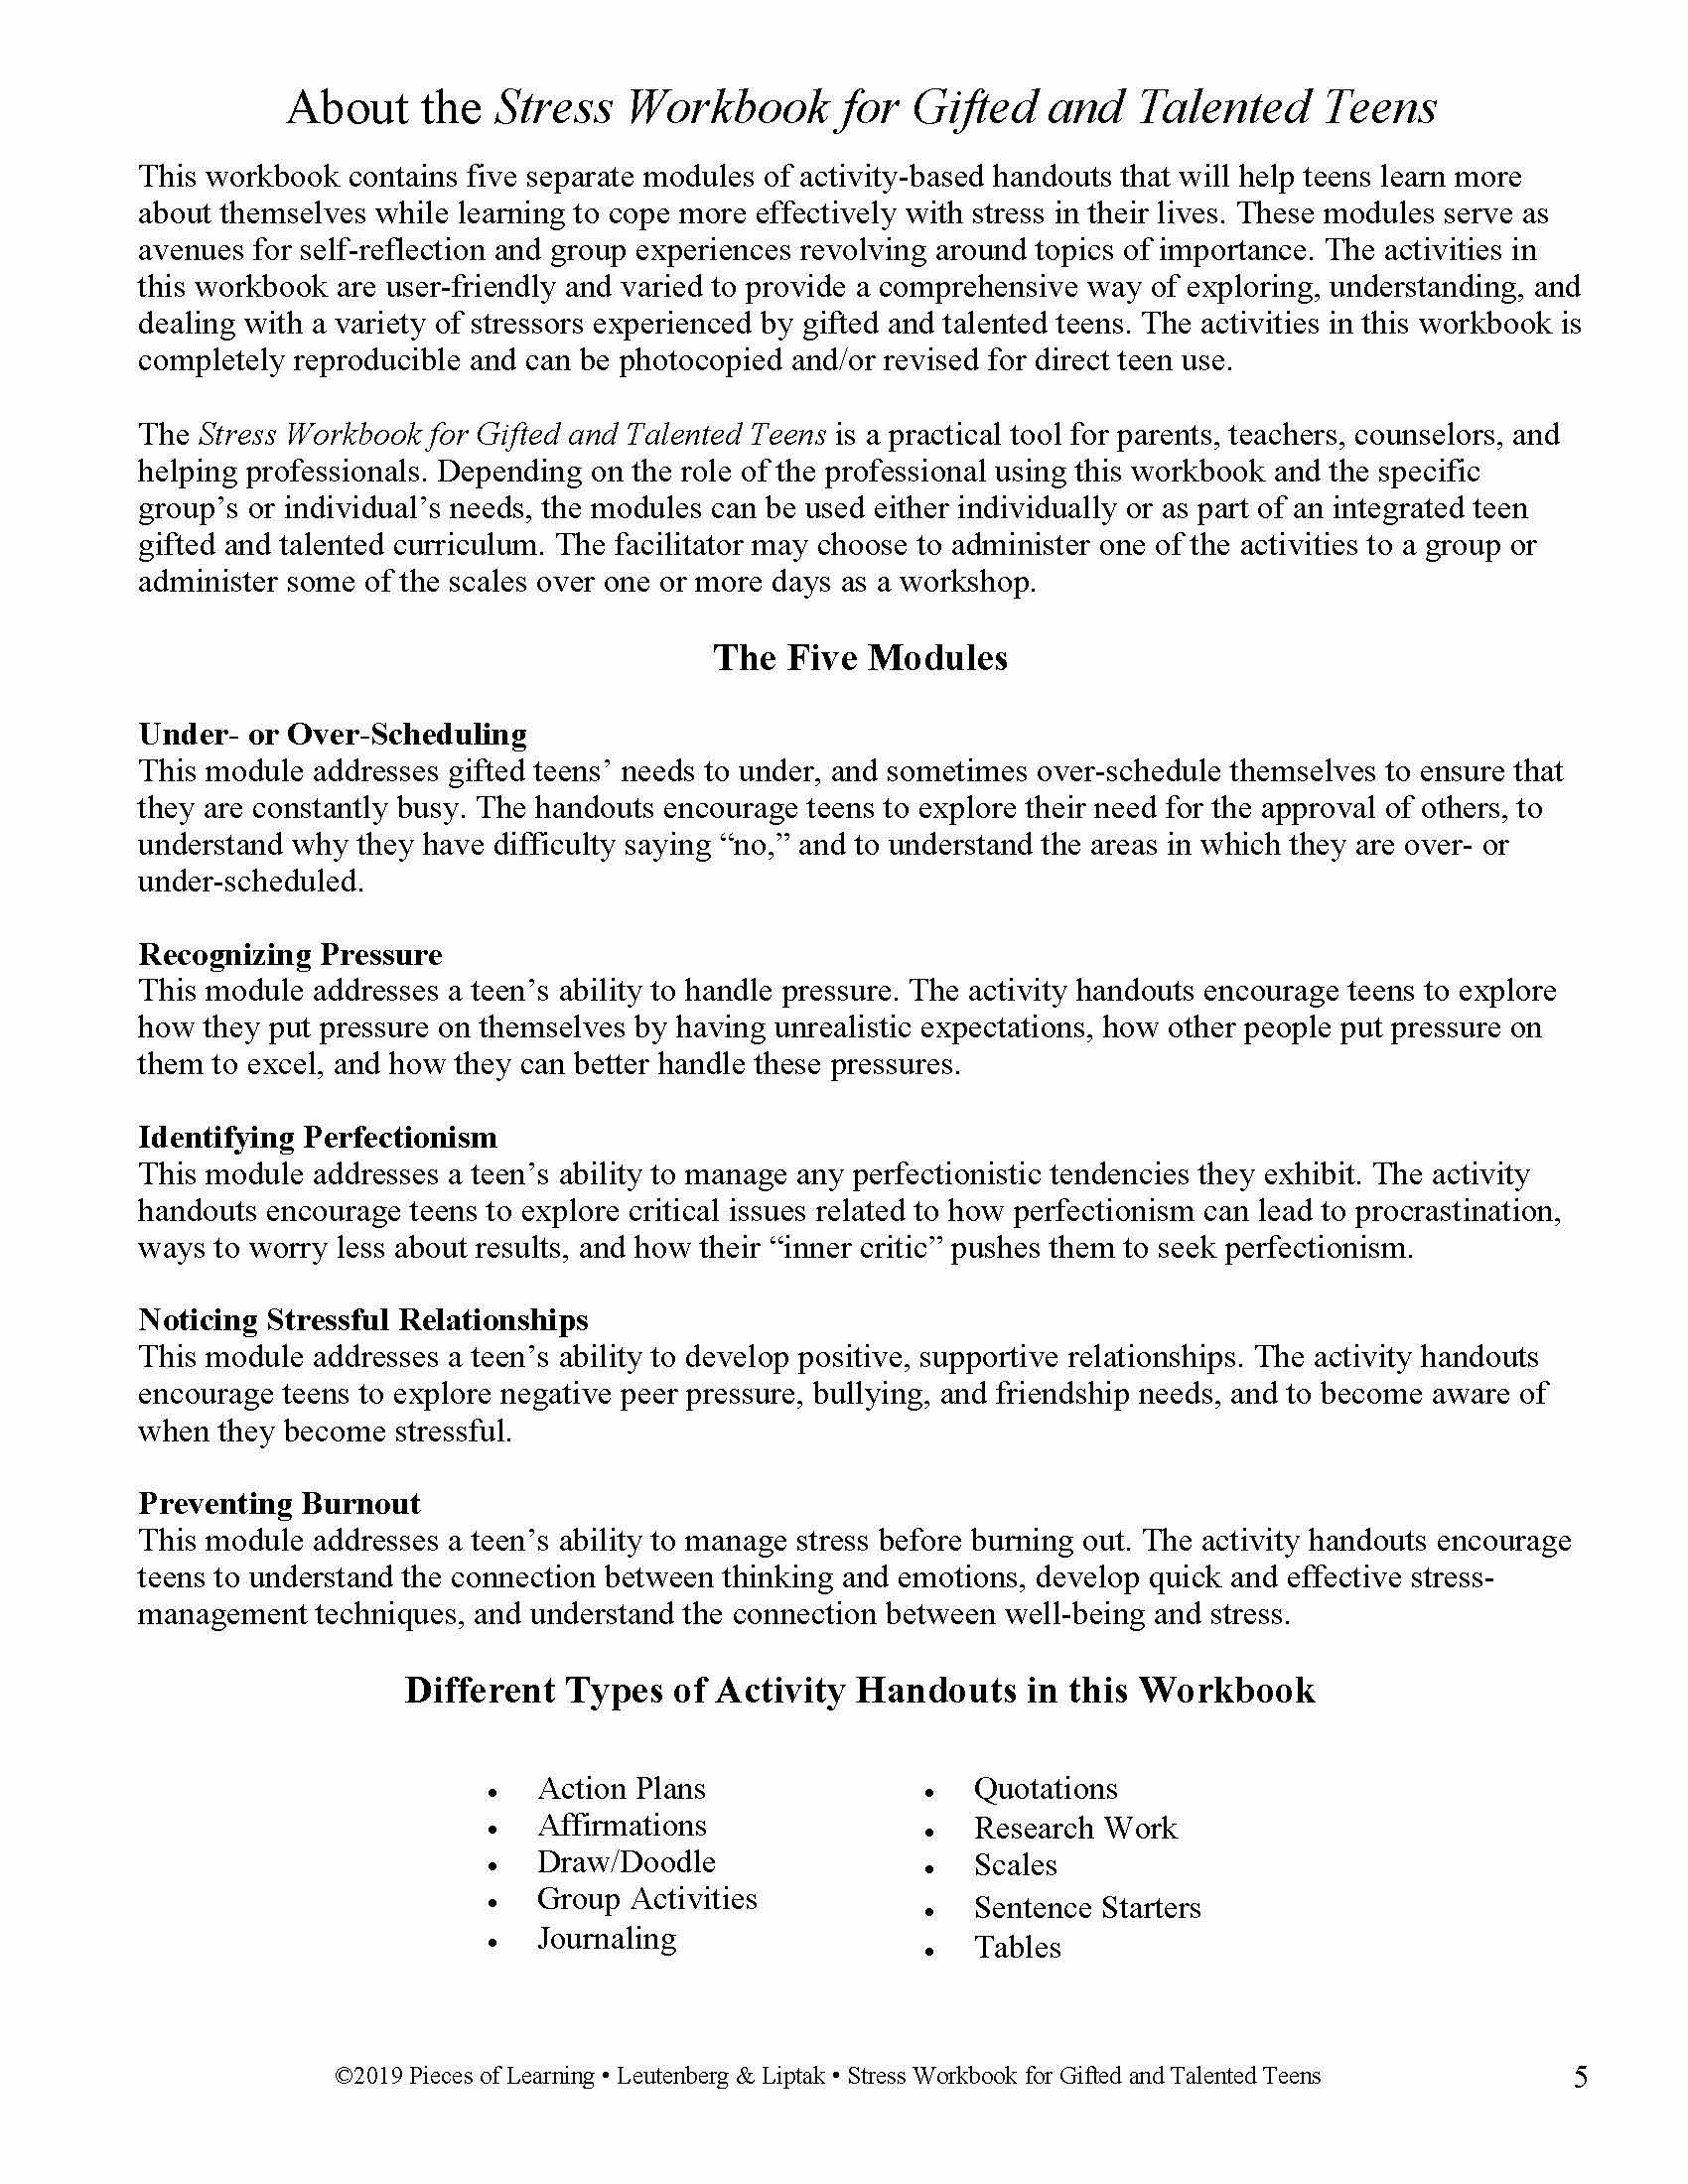 Stress Workbook for G/T Teens